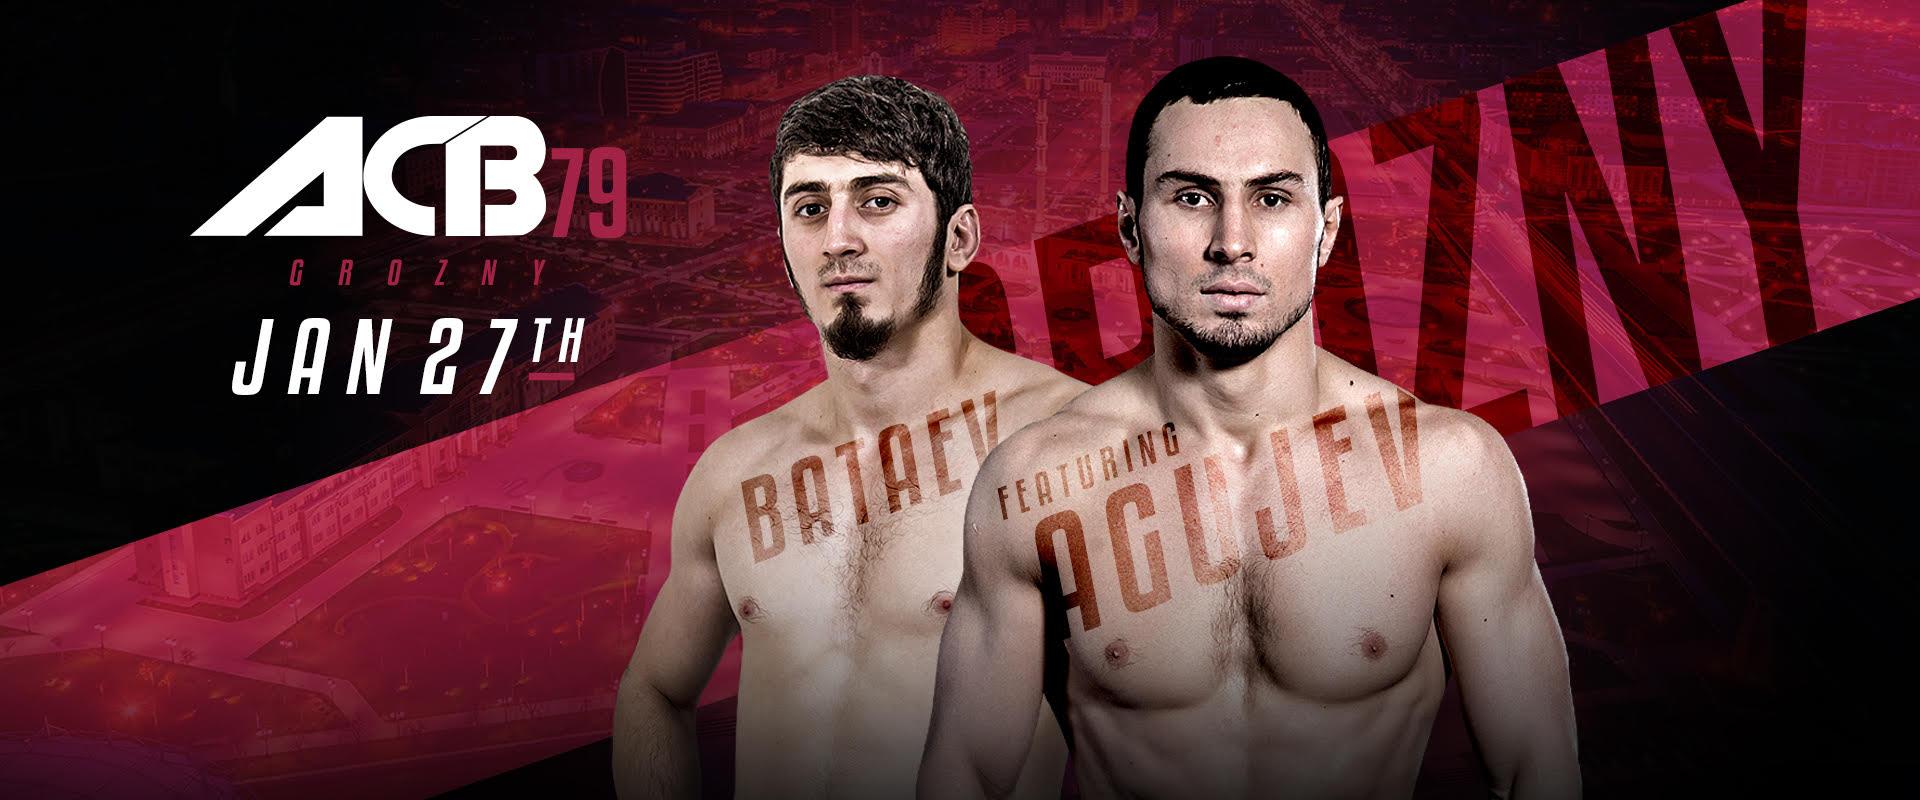 WATCH: ACB 79 - Alfaya vs. Agujev - FREE Live Stream